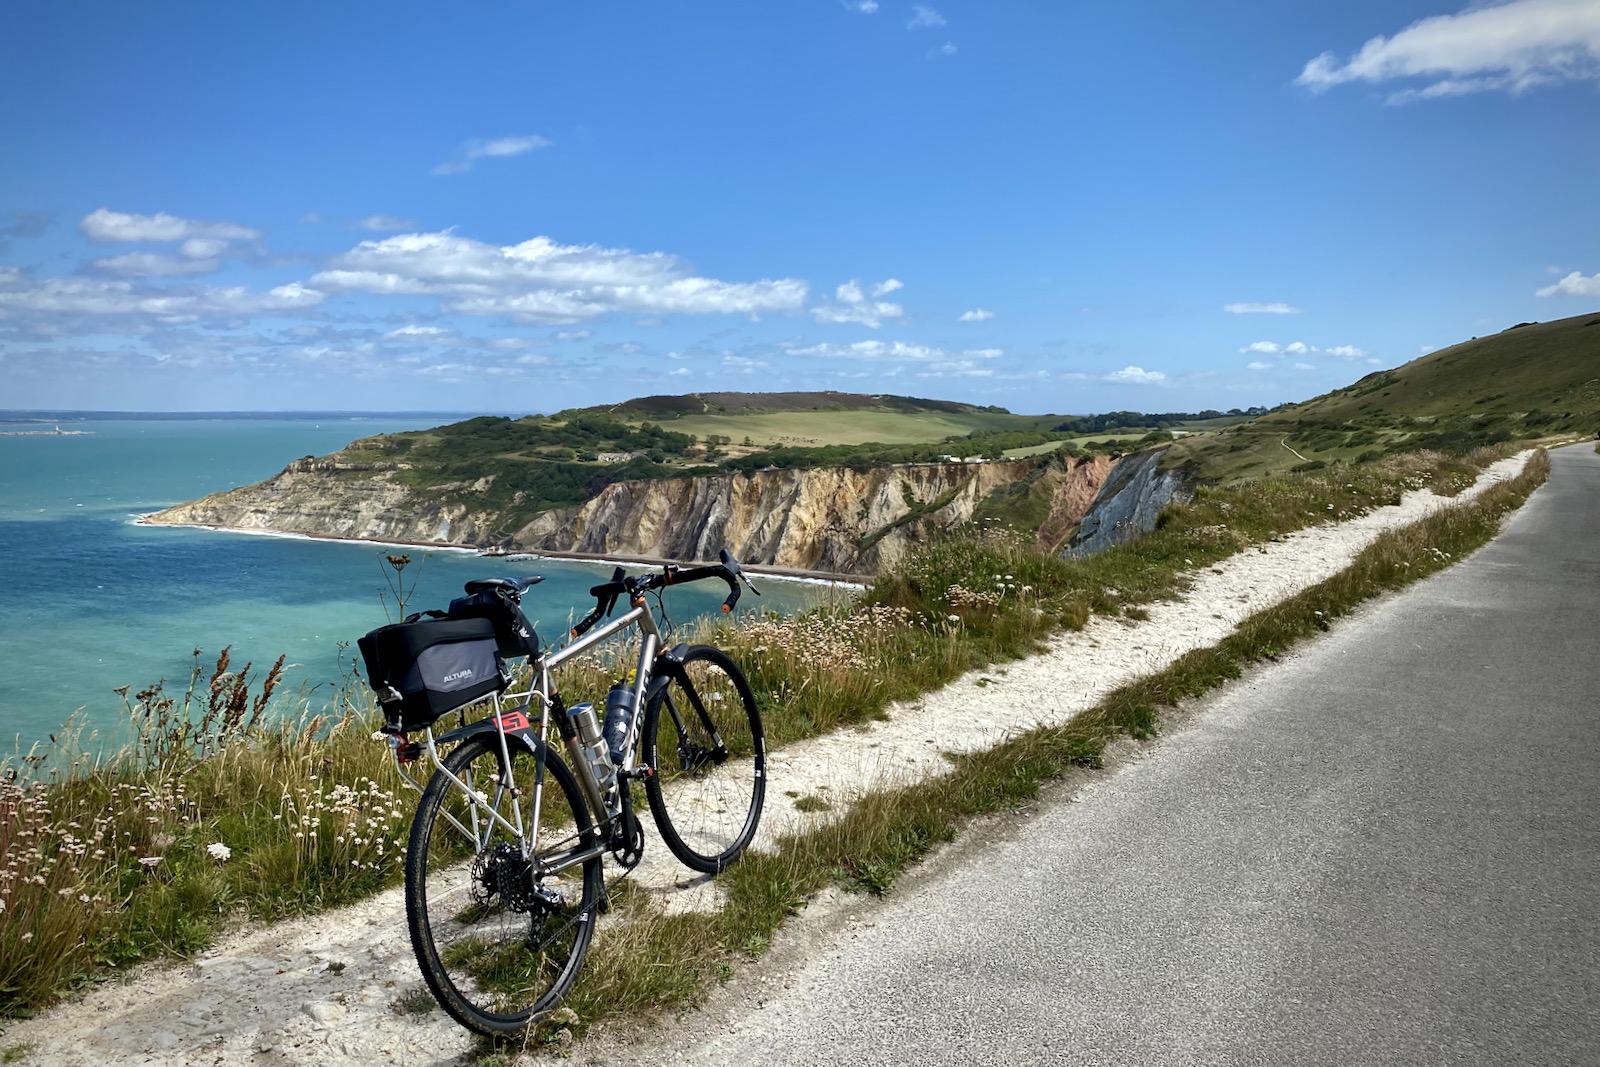 Tim Wiggins Kona Isle of Wight